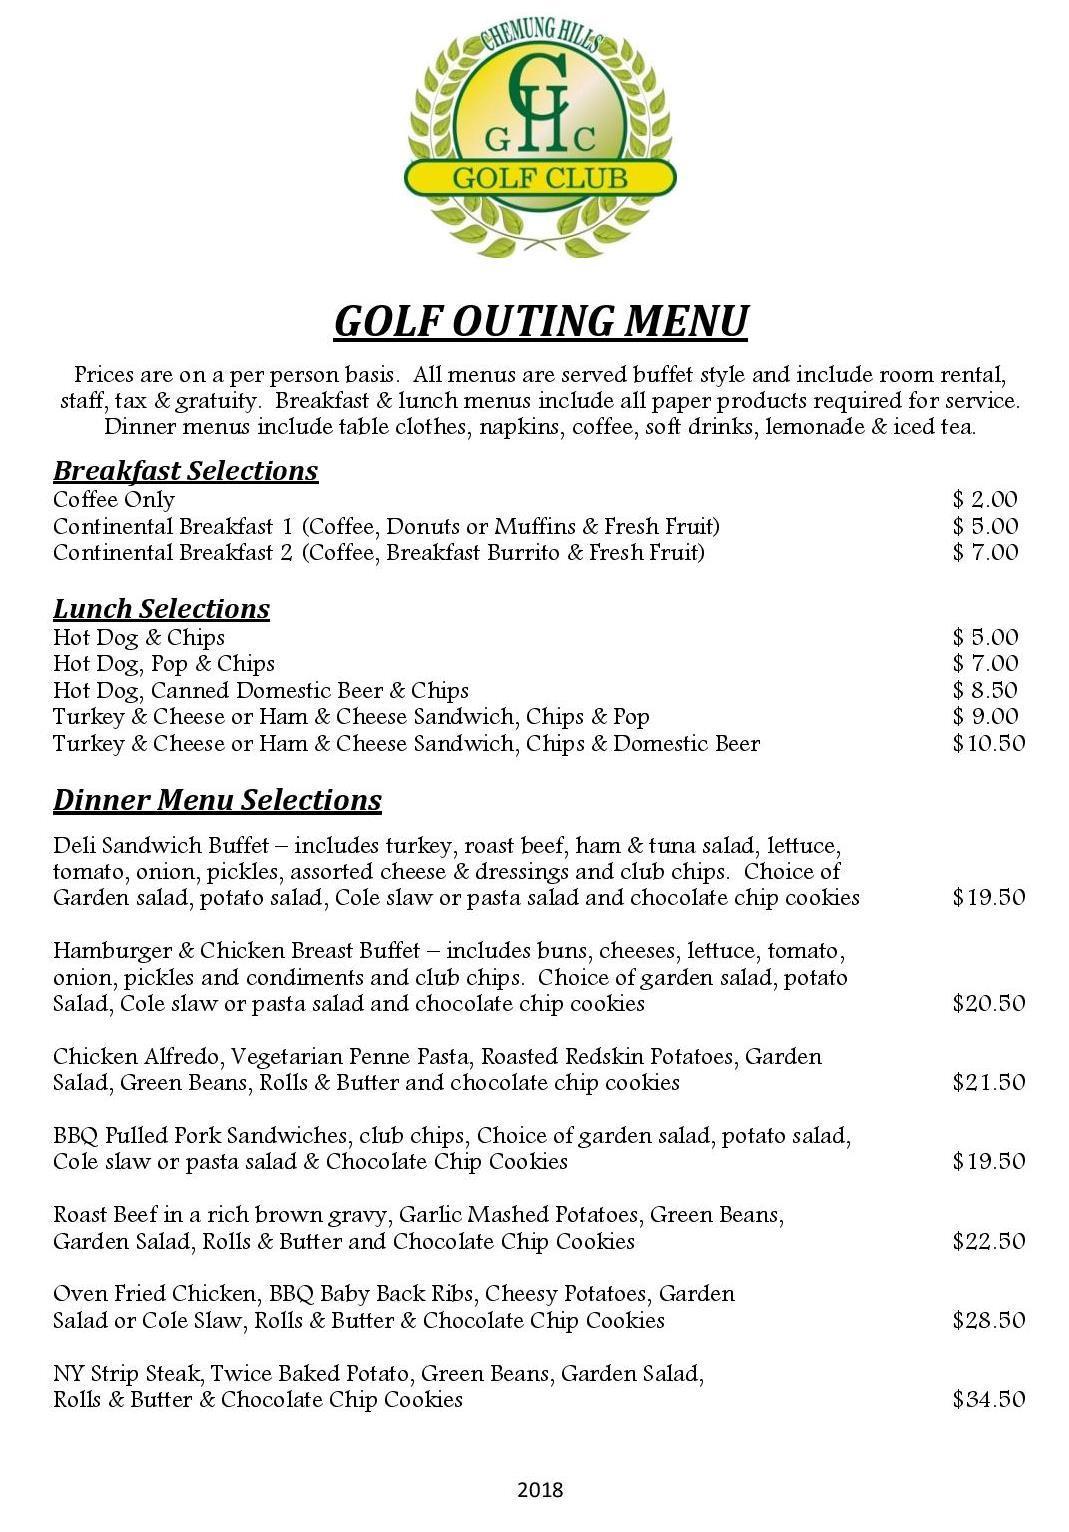 Golf Outing Menu 2018